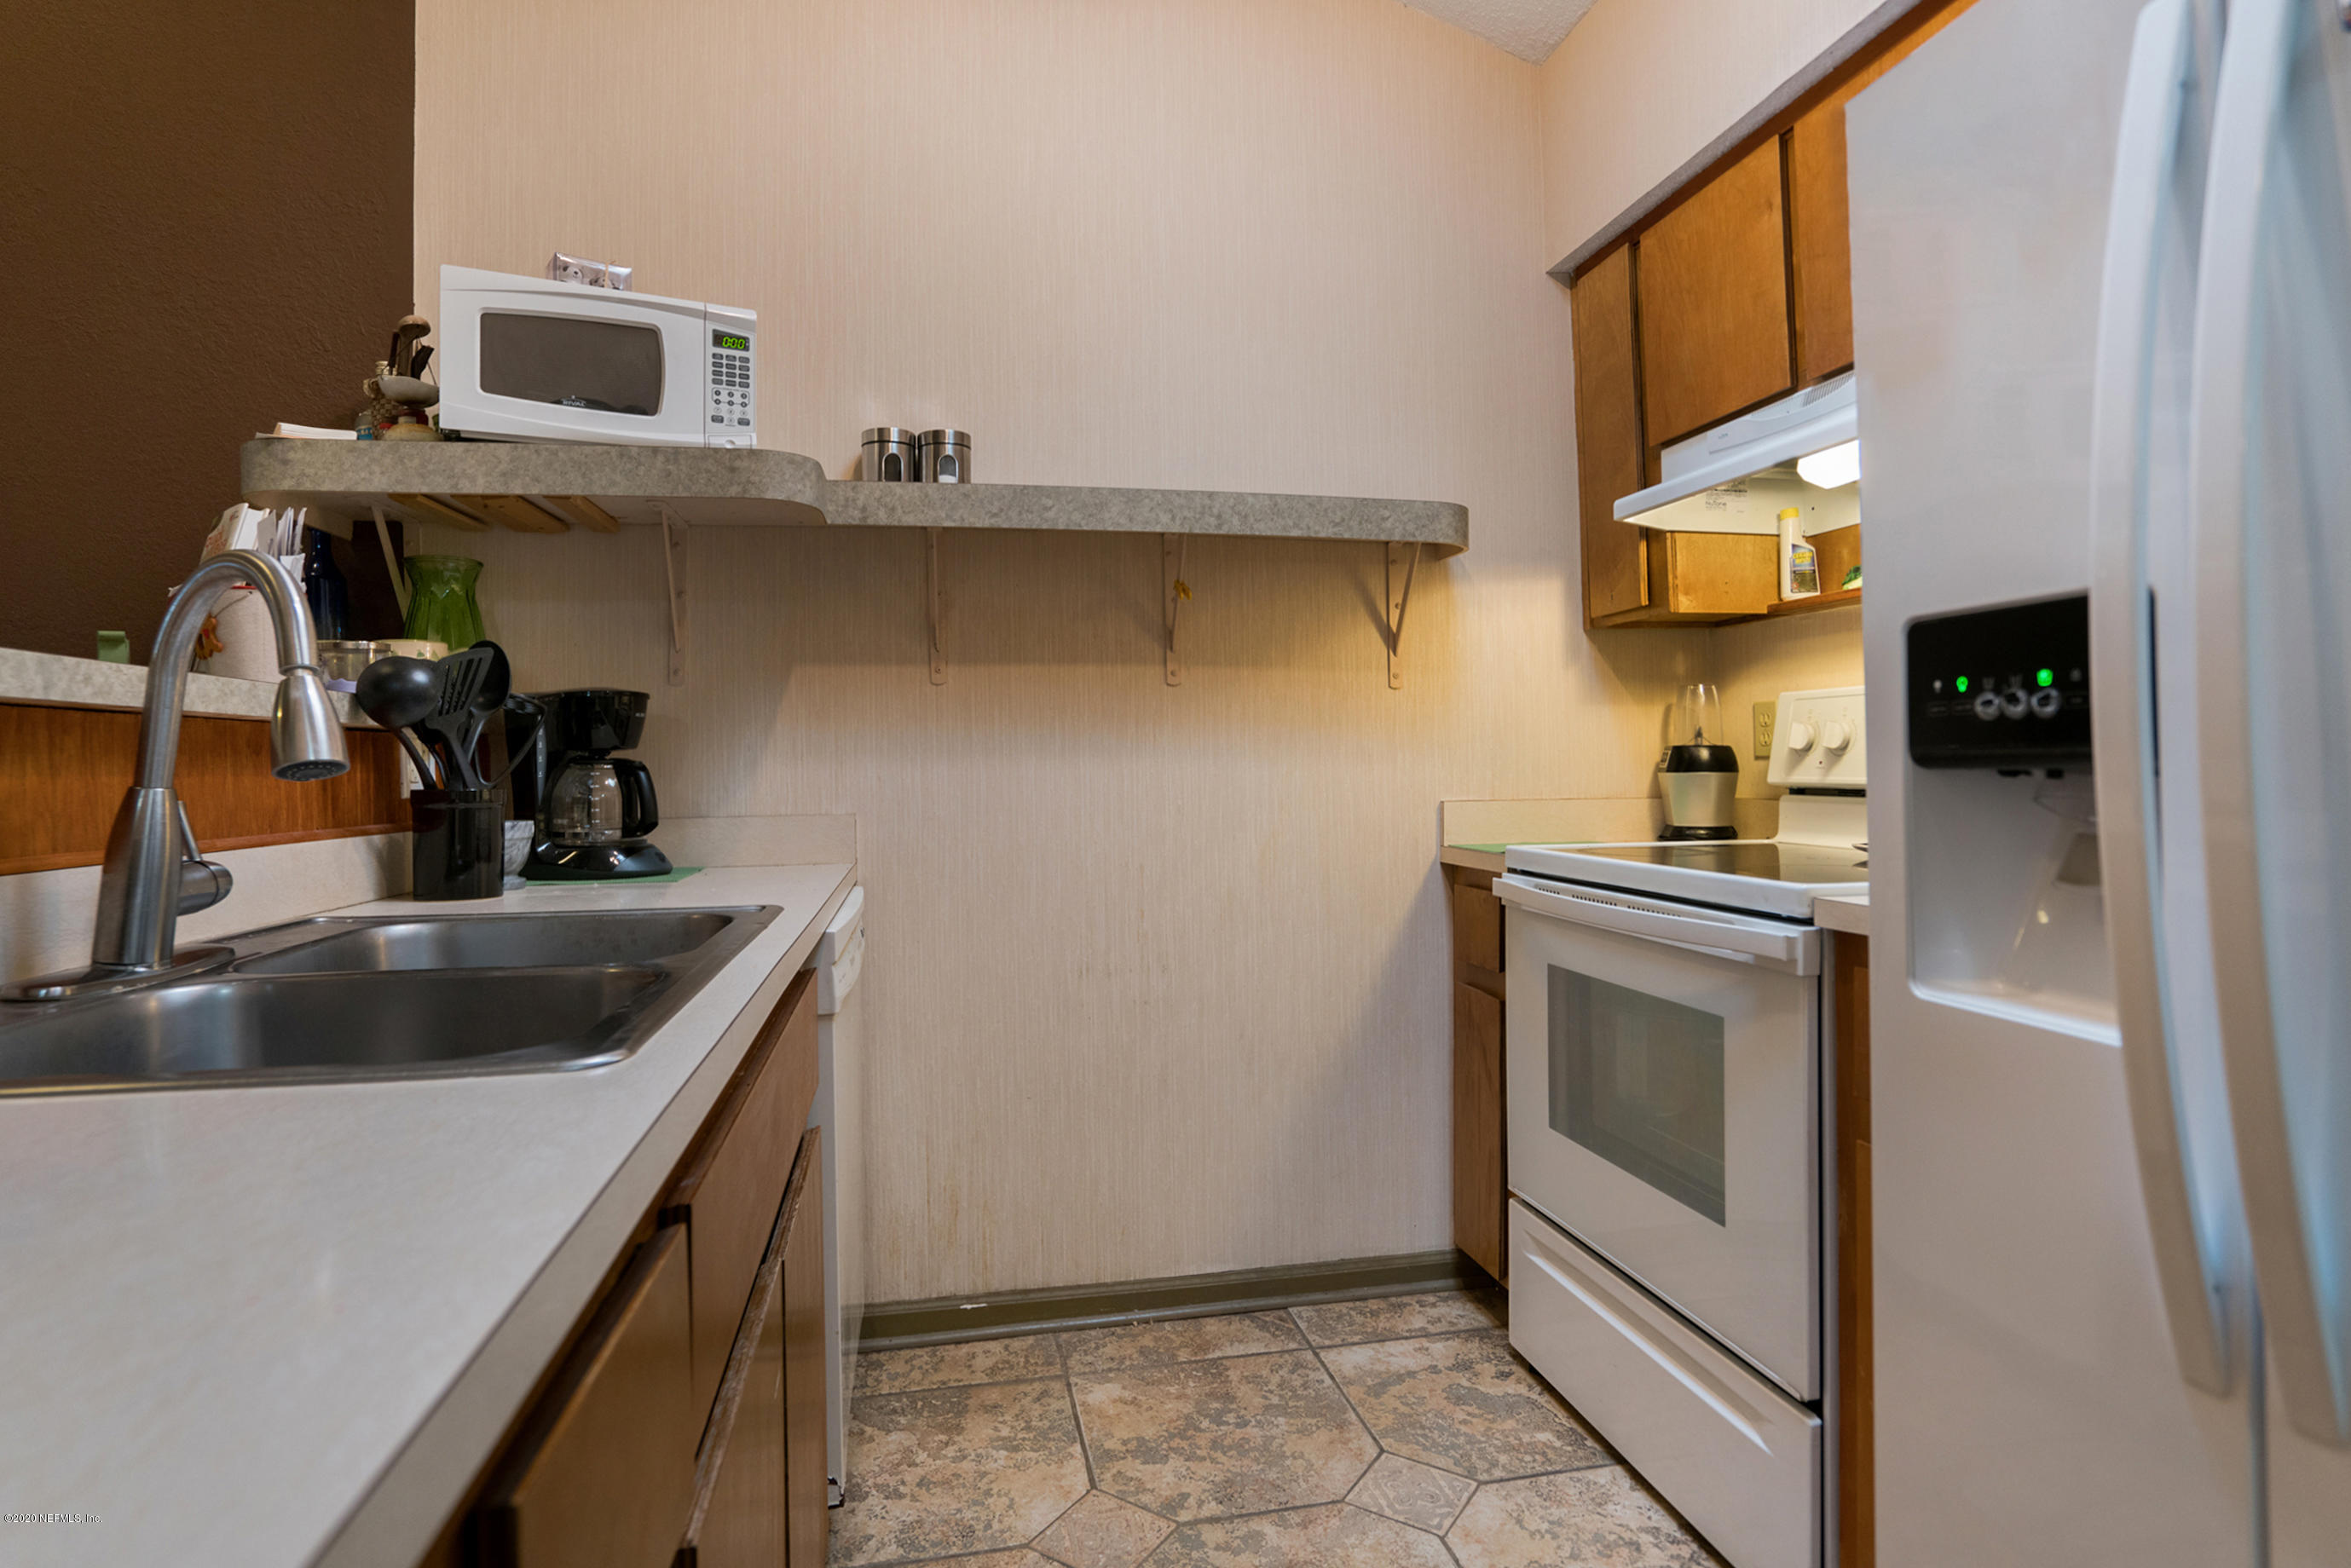 1333 ELLIS TRACE, JACKSONVILLE, FLORIDA 32205, 2 Bedrooms Bedrooms, ,1 BathroomBathrooms,Residential,For sale,ELLIS TRACE,1037579